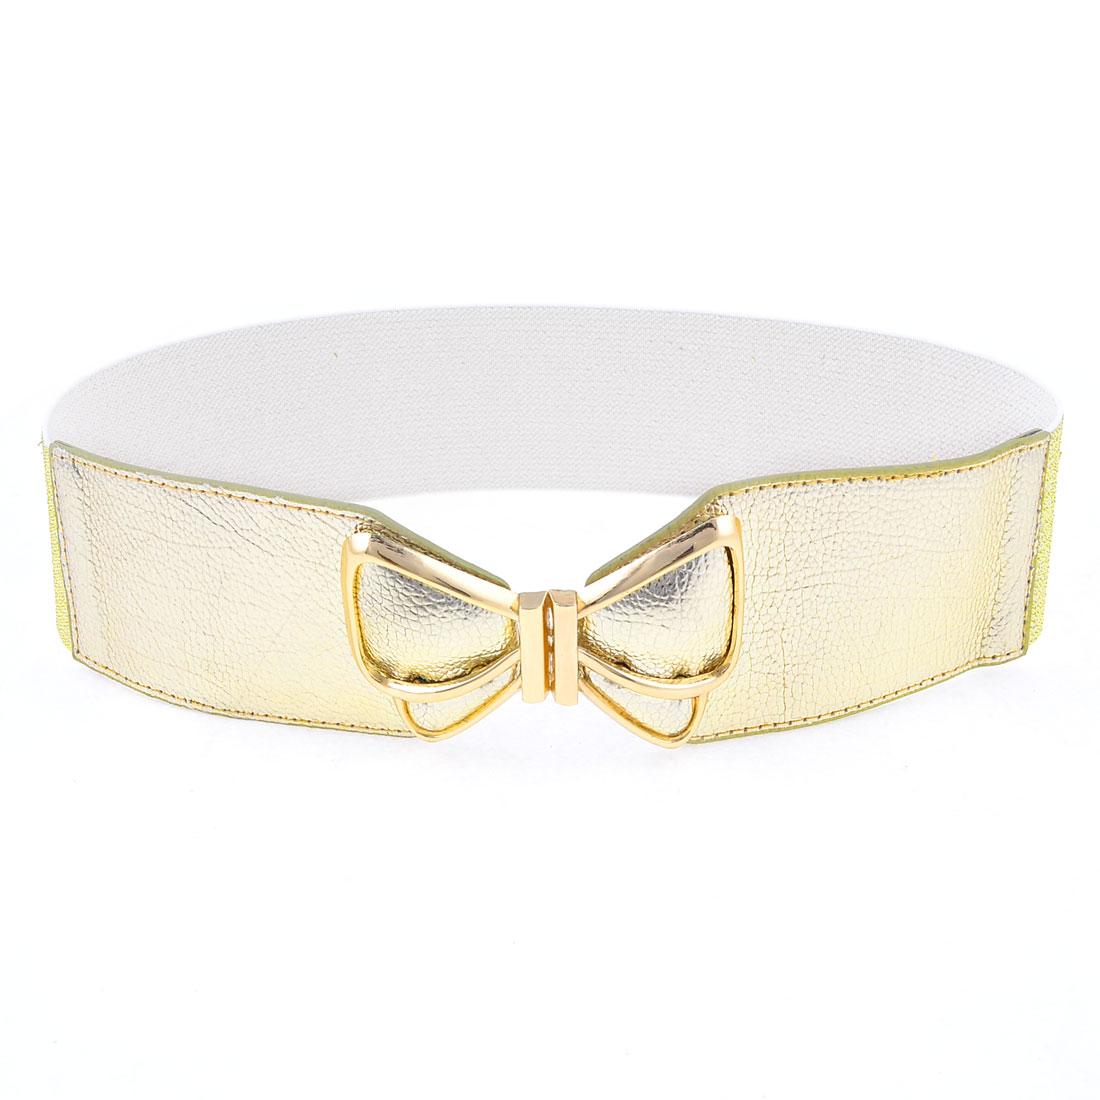 Woman Butterfly Detail Interlocking Buckle Glittery Elastic Waist Belt Gold Tone